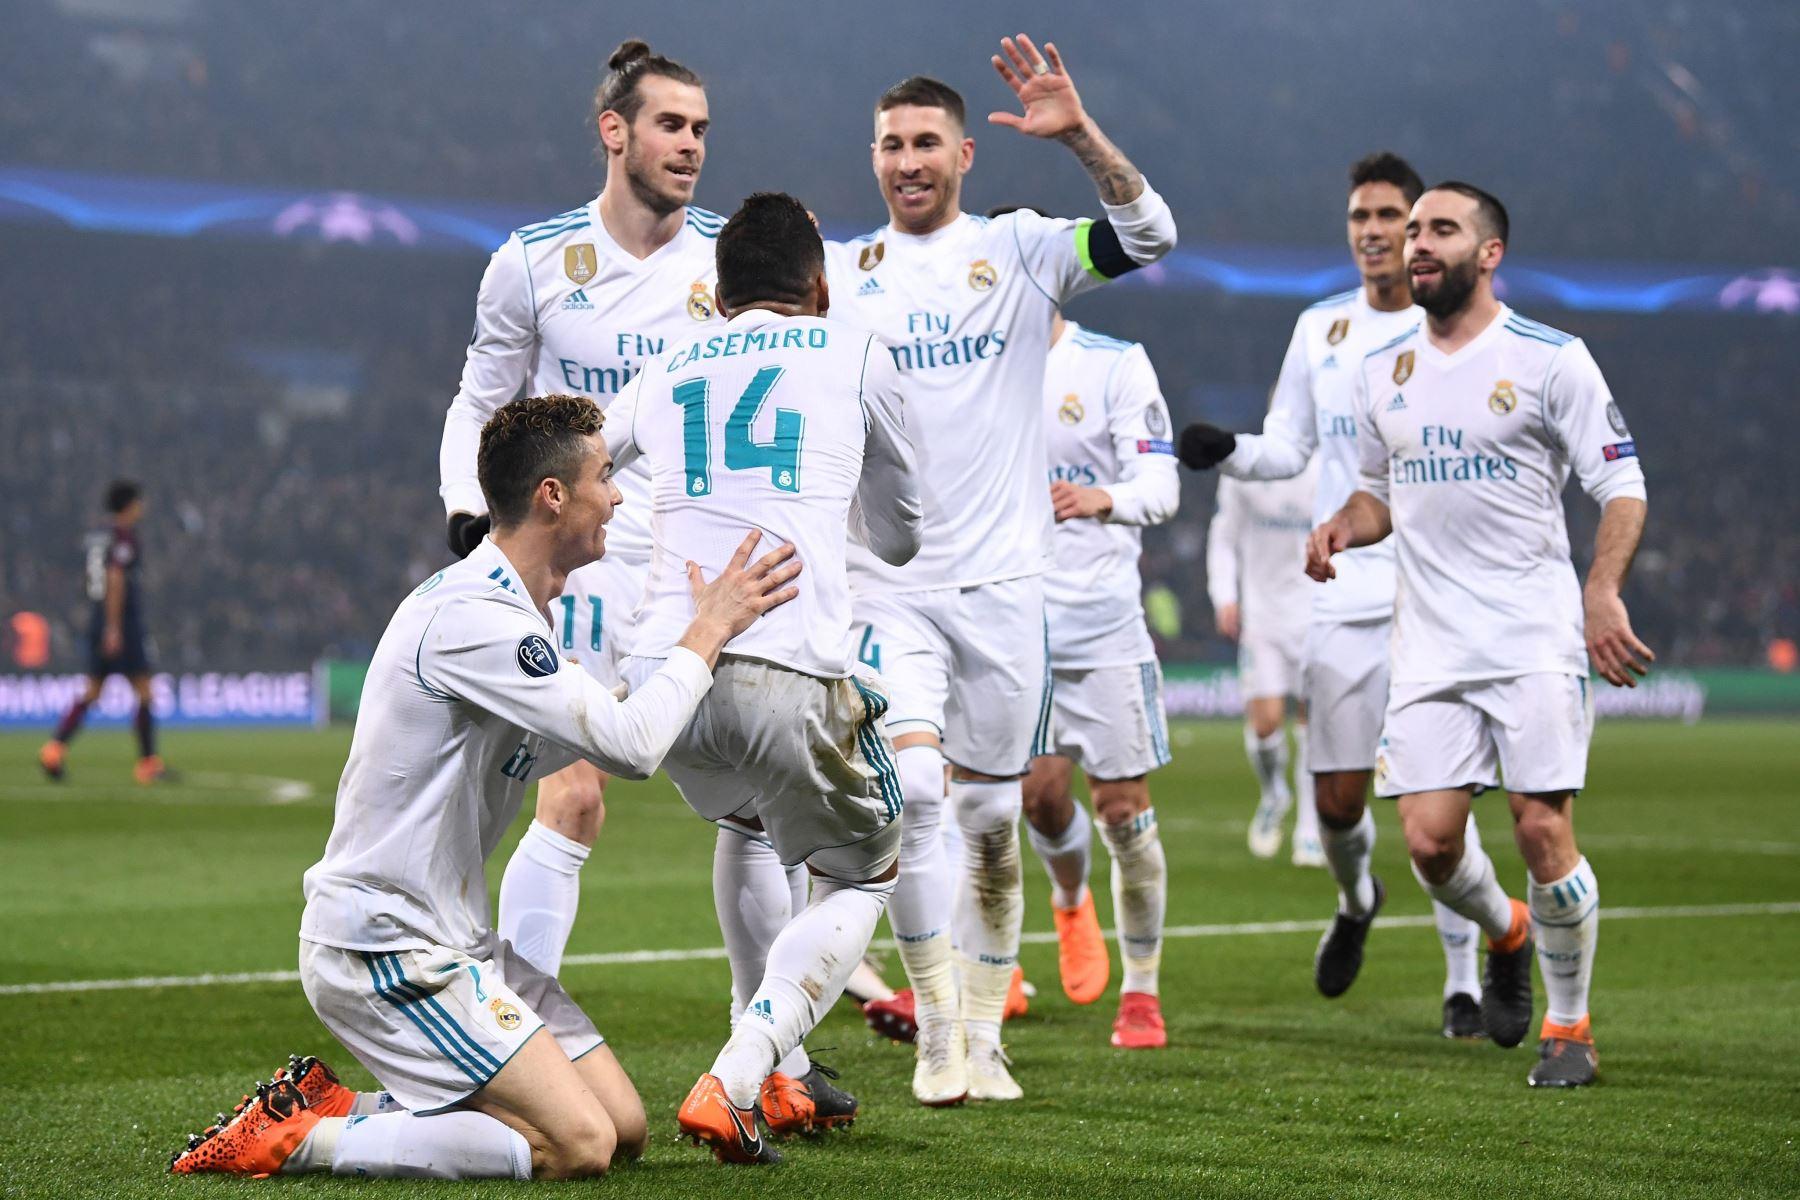 Real Madrid celebra el triunfo de  2 a 1 al  Paris Saint-Germain , en la ronda de octavos de final de la UEFA Champions League.Foto:AFP